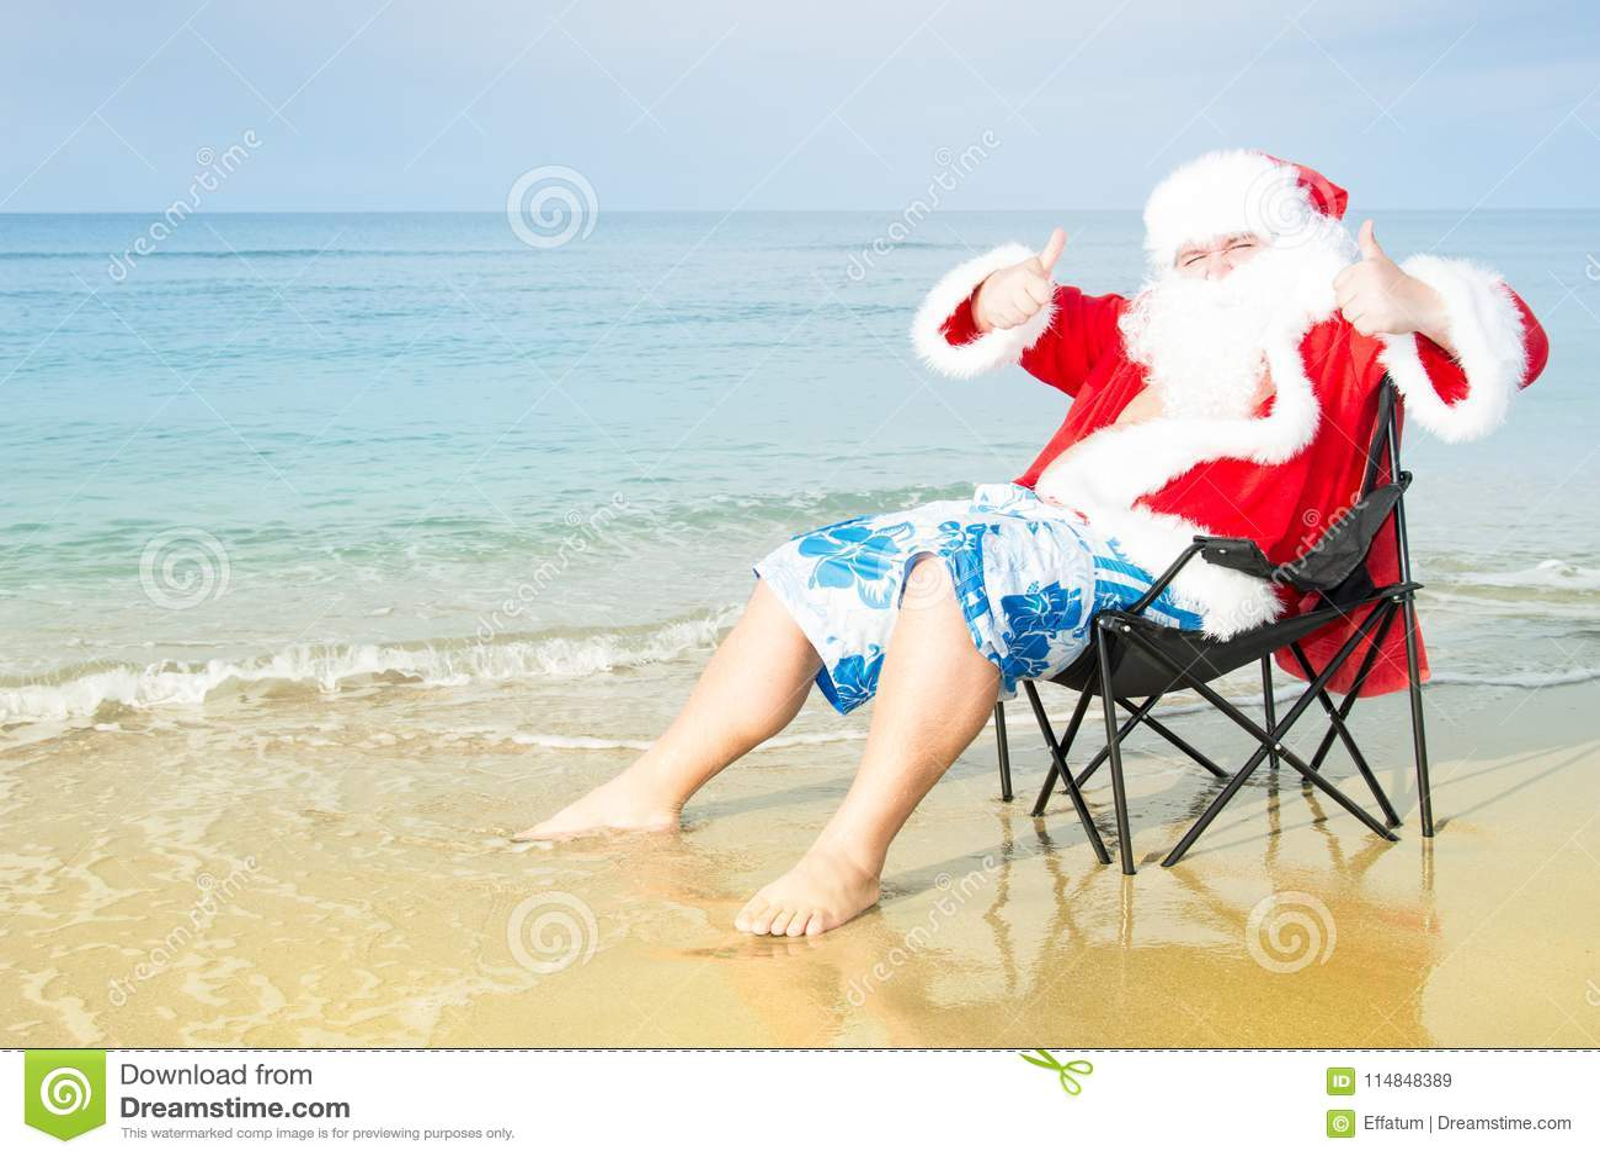 Christmas In Australia Santa.Funny Santa In Shorts On The Beach Christmas In The Tropics